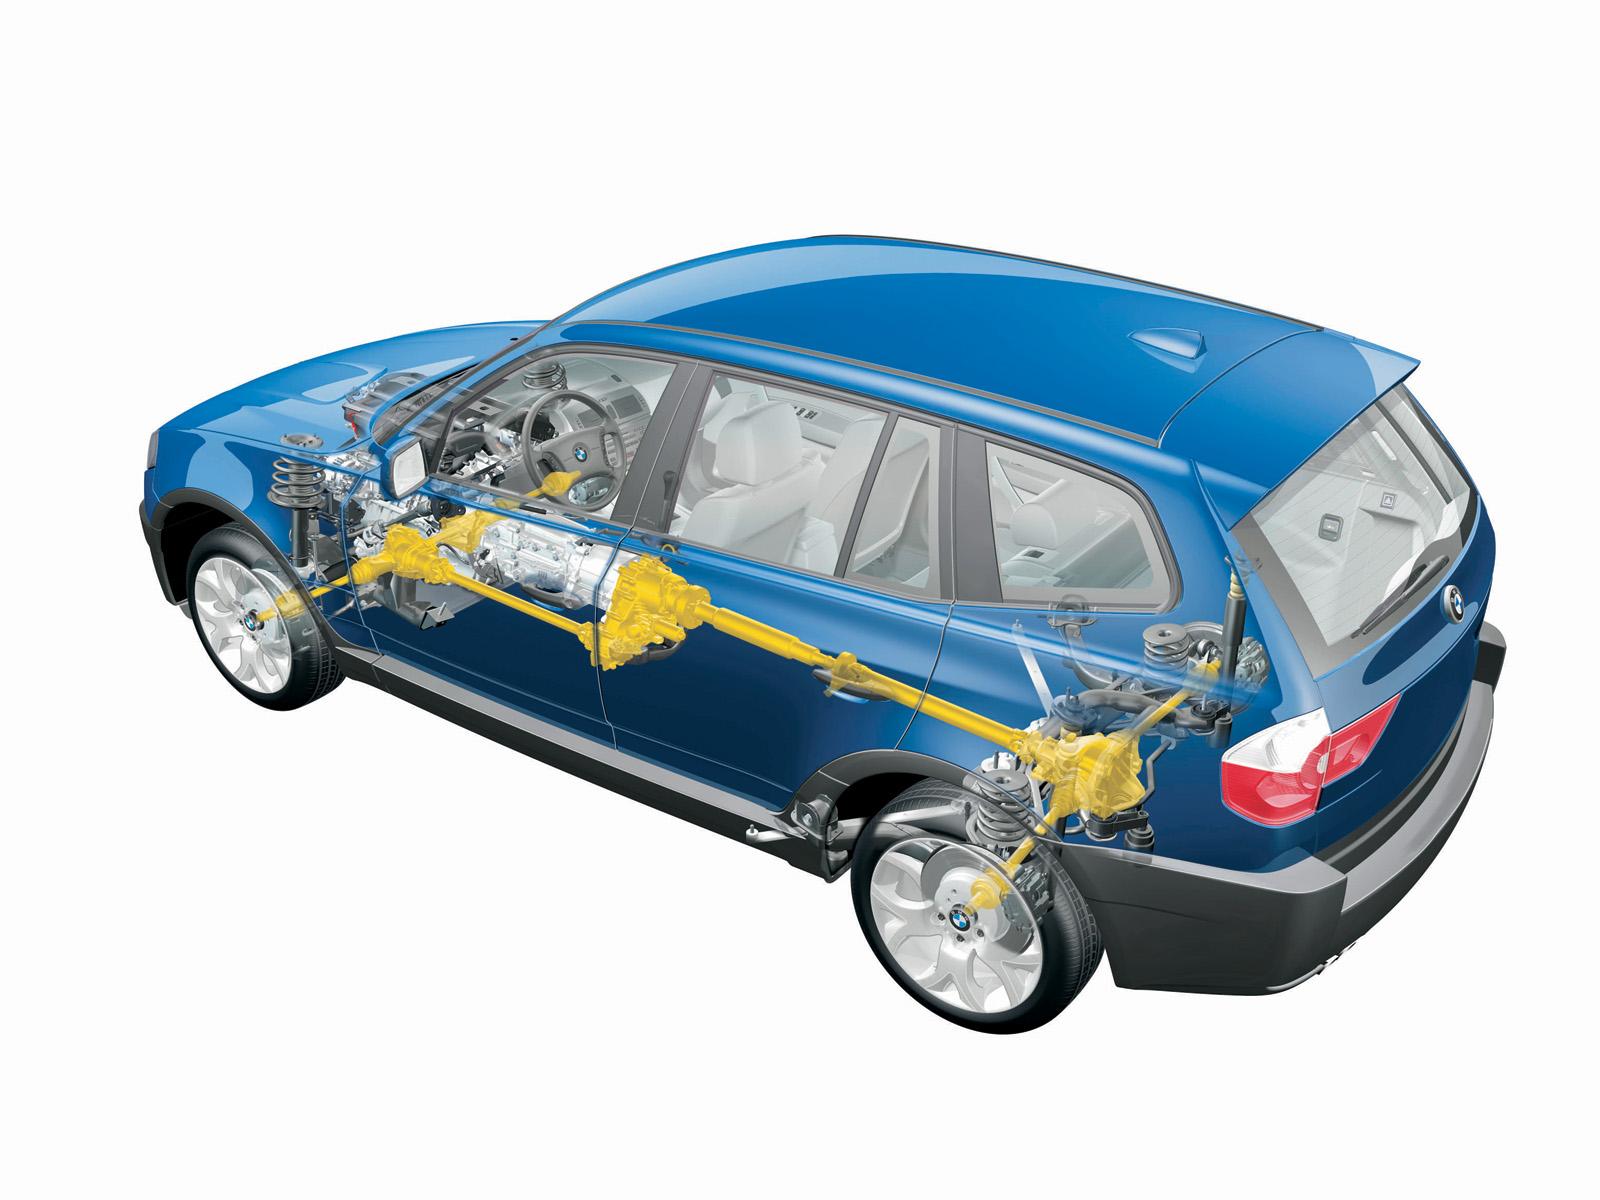 New Fuel Pump Module Assembly for BMW X3 E83 2.0i 2.5i 3.0i 2003-2006